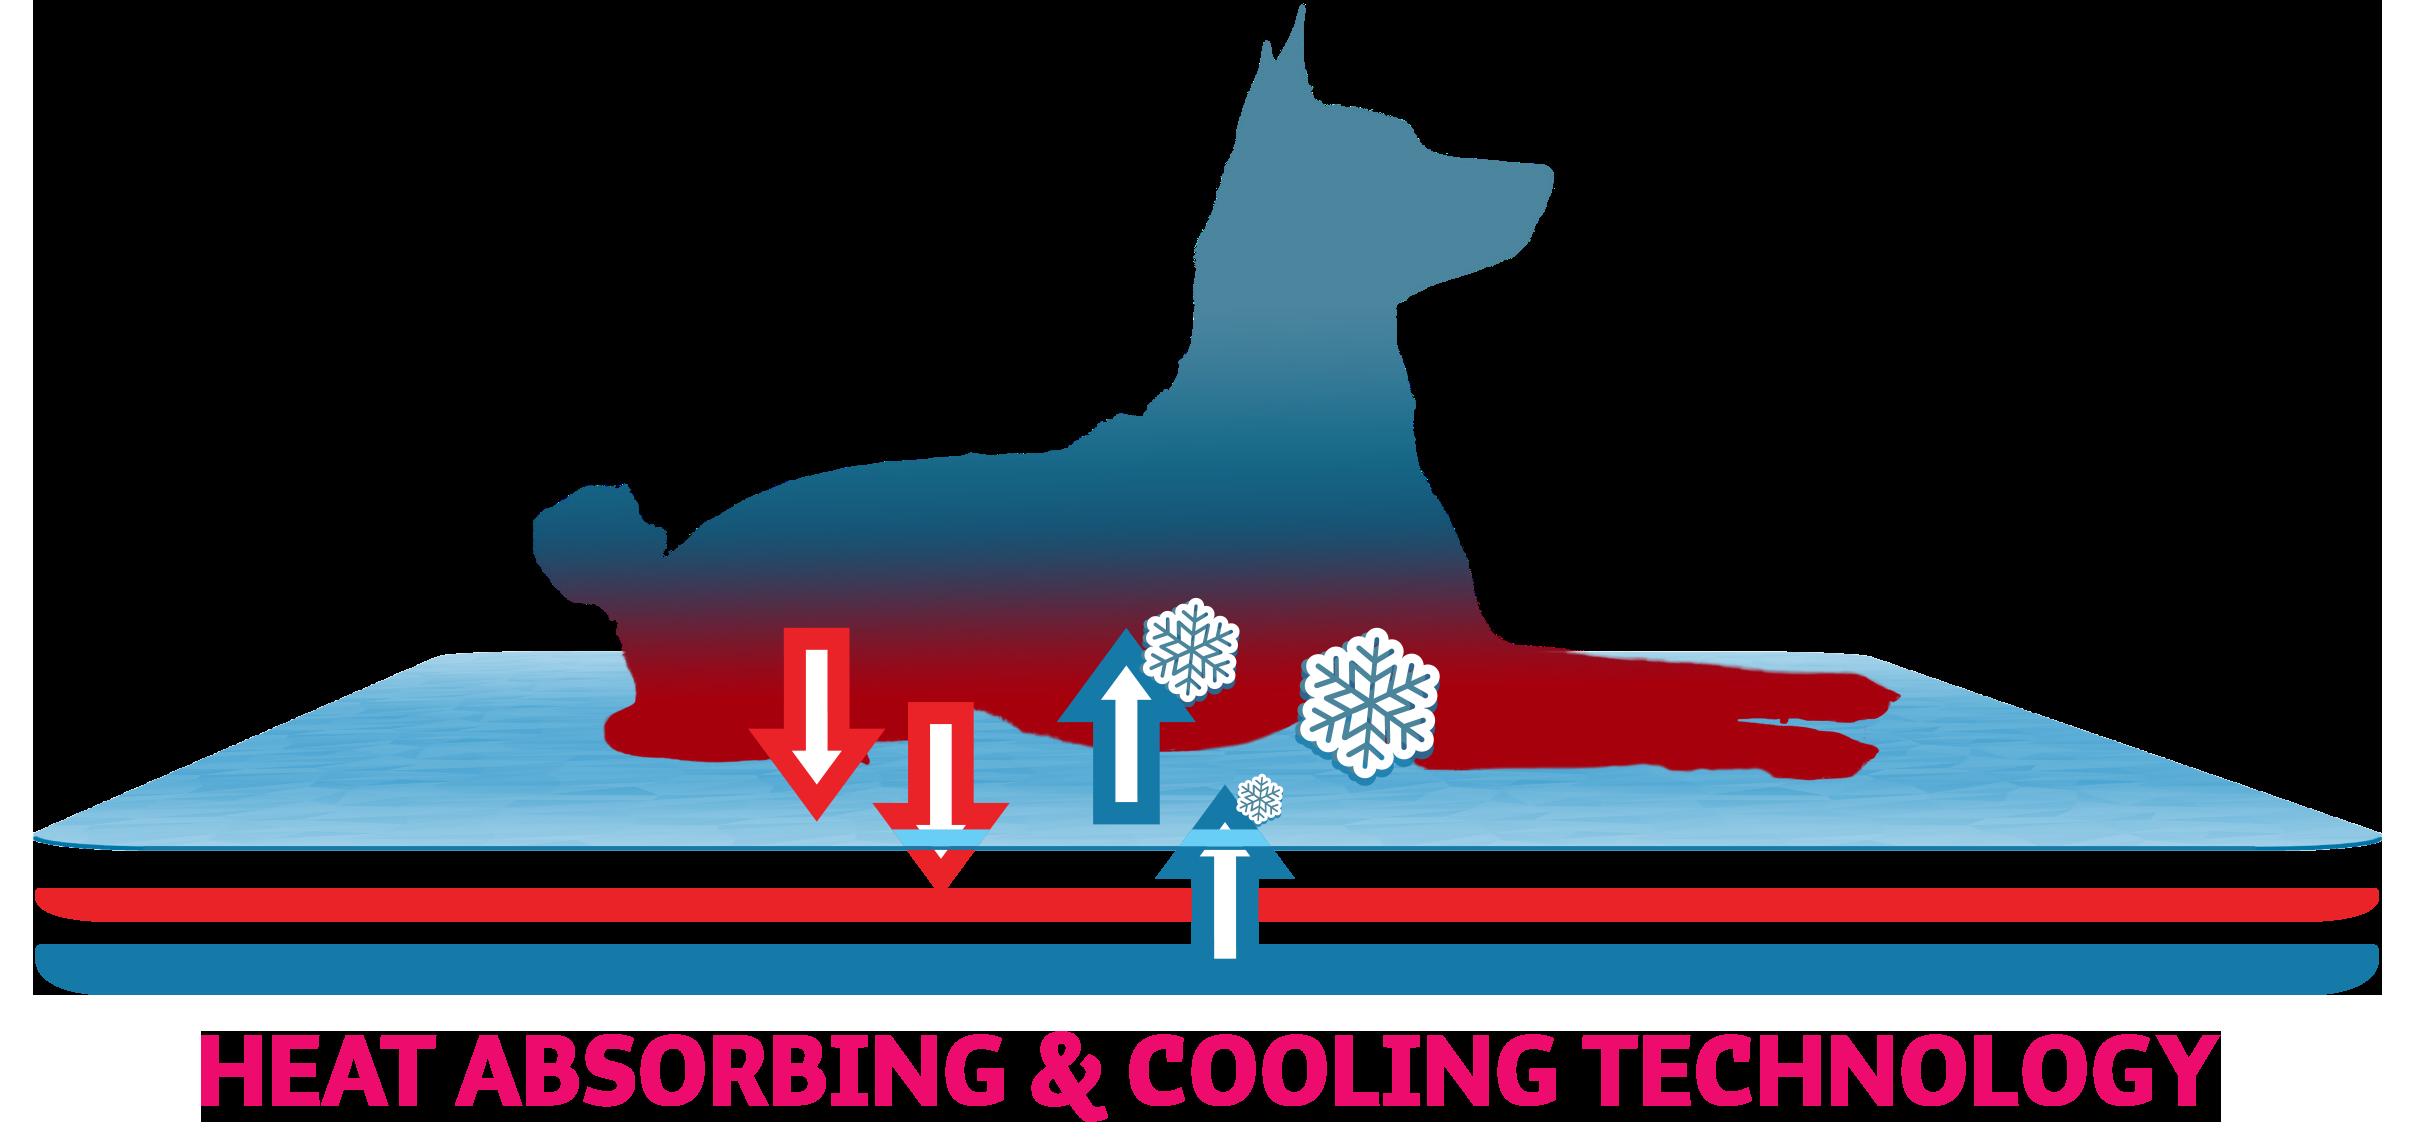 CoolPets_Heat_Absorbing_Technology_EN